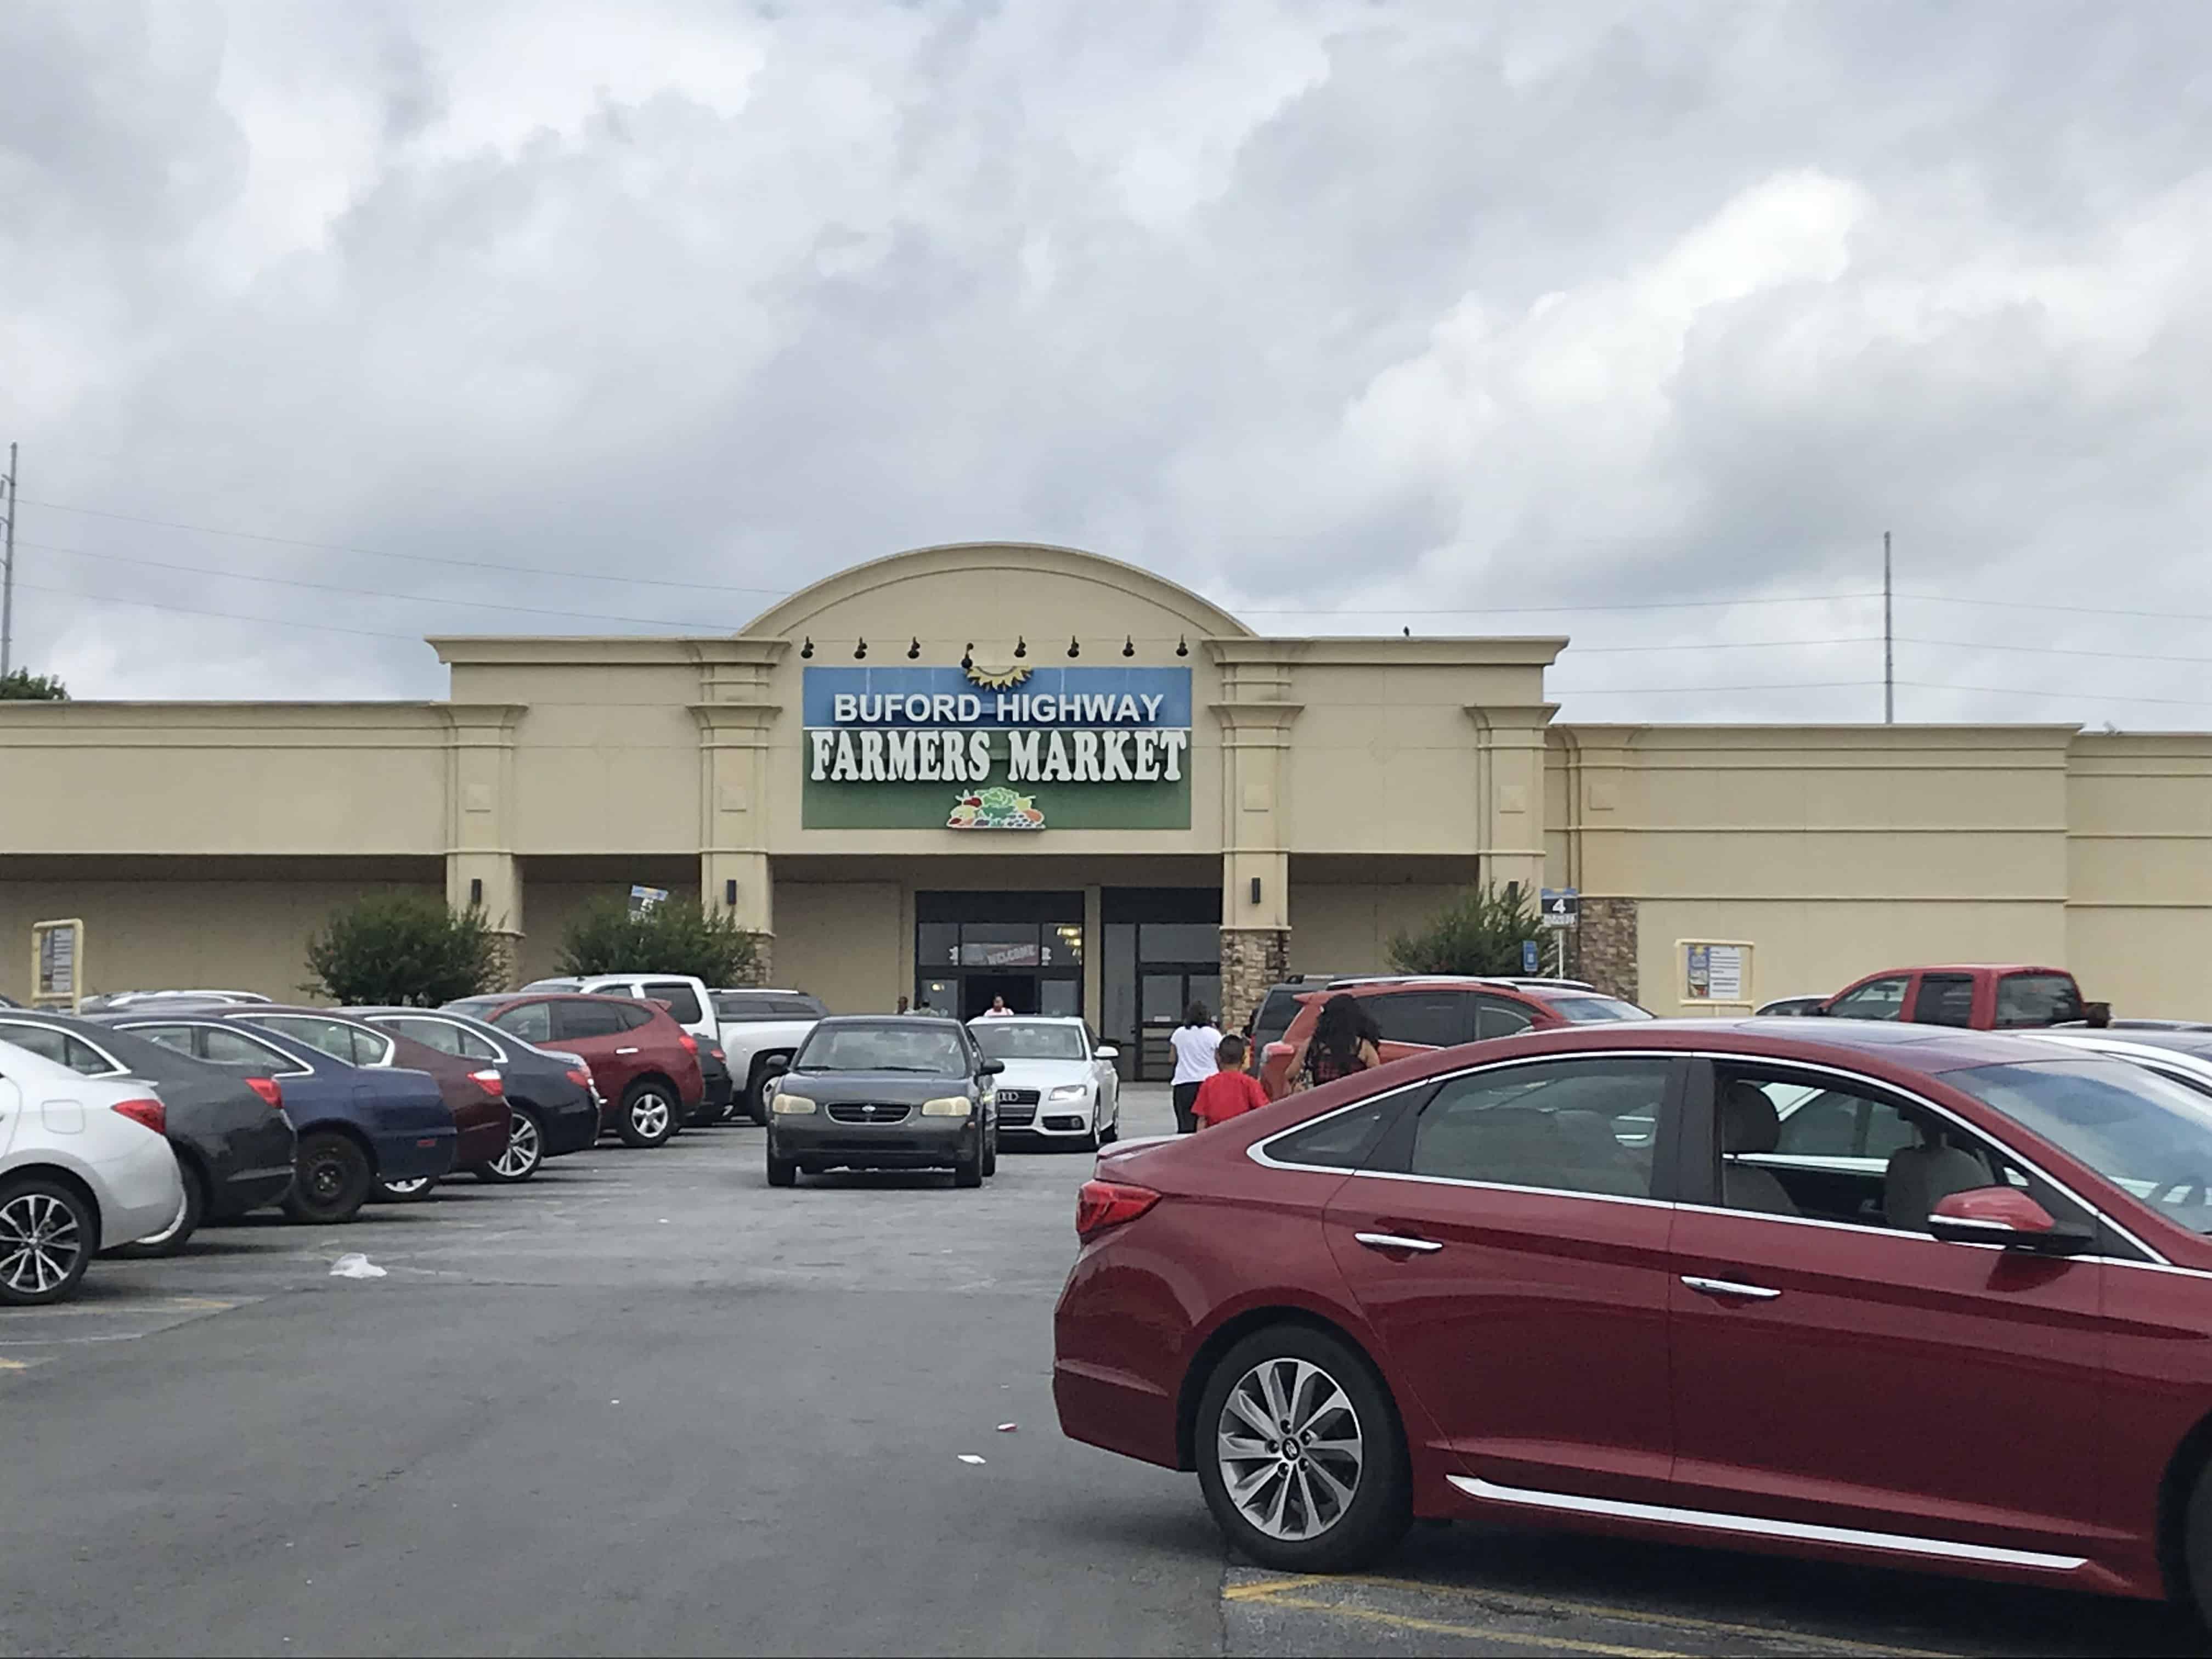 Buford Highway Farmers Market Entrance